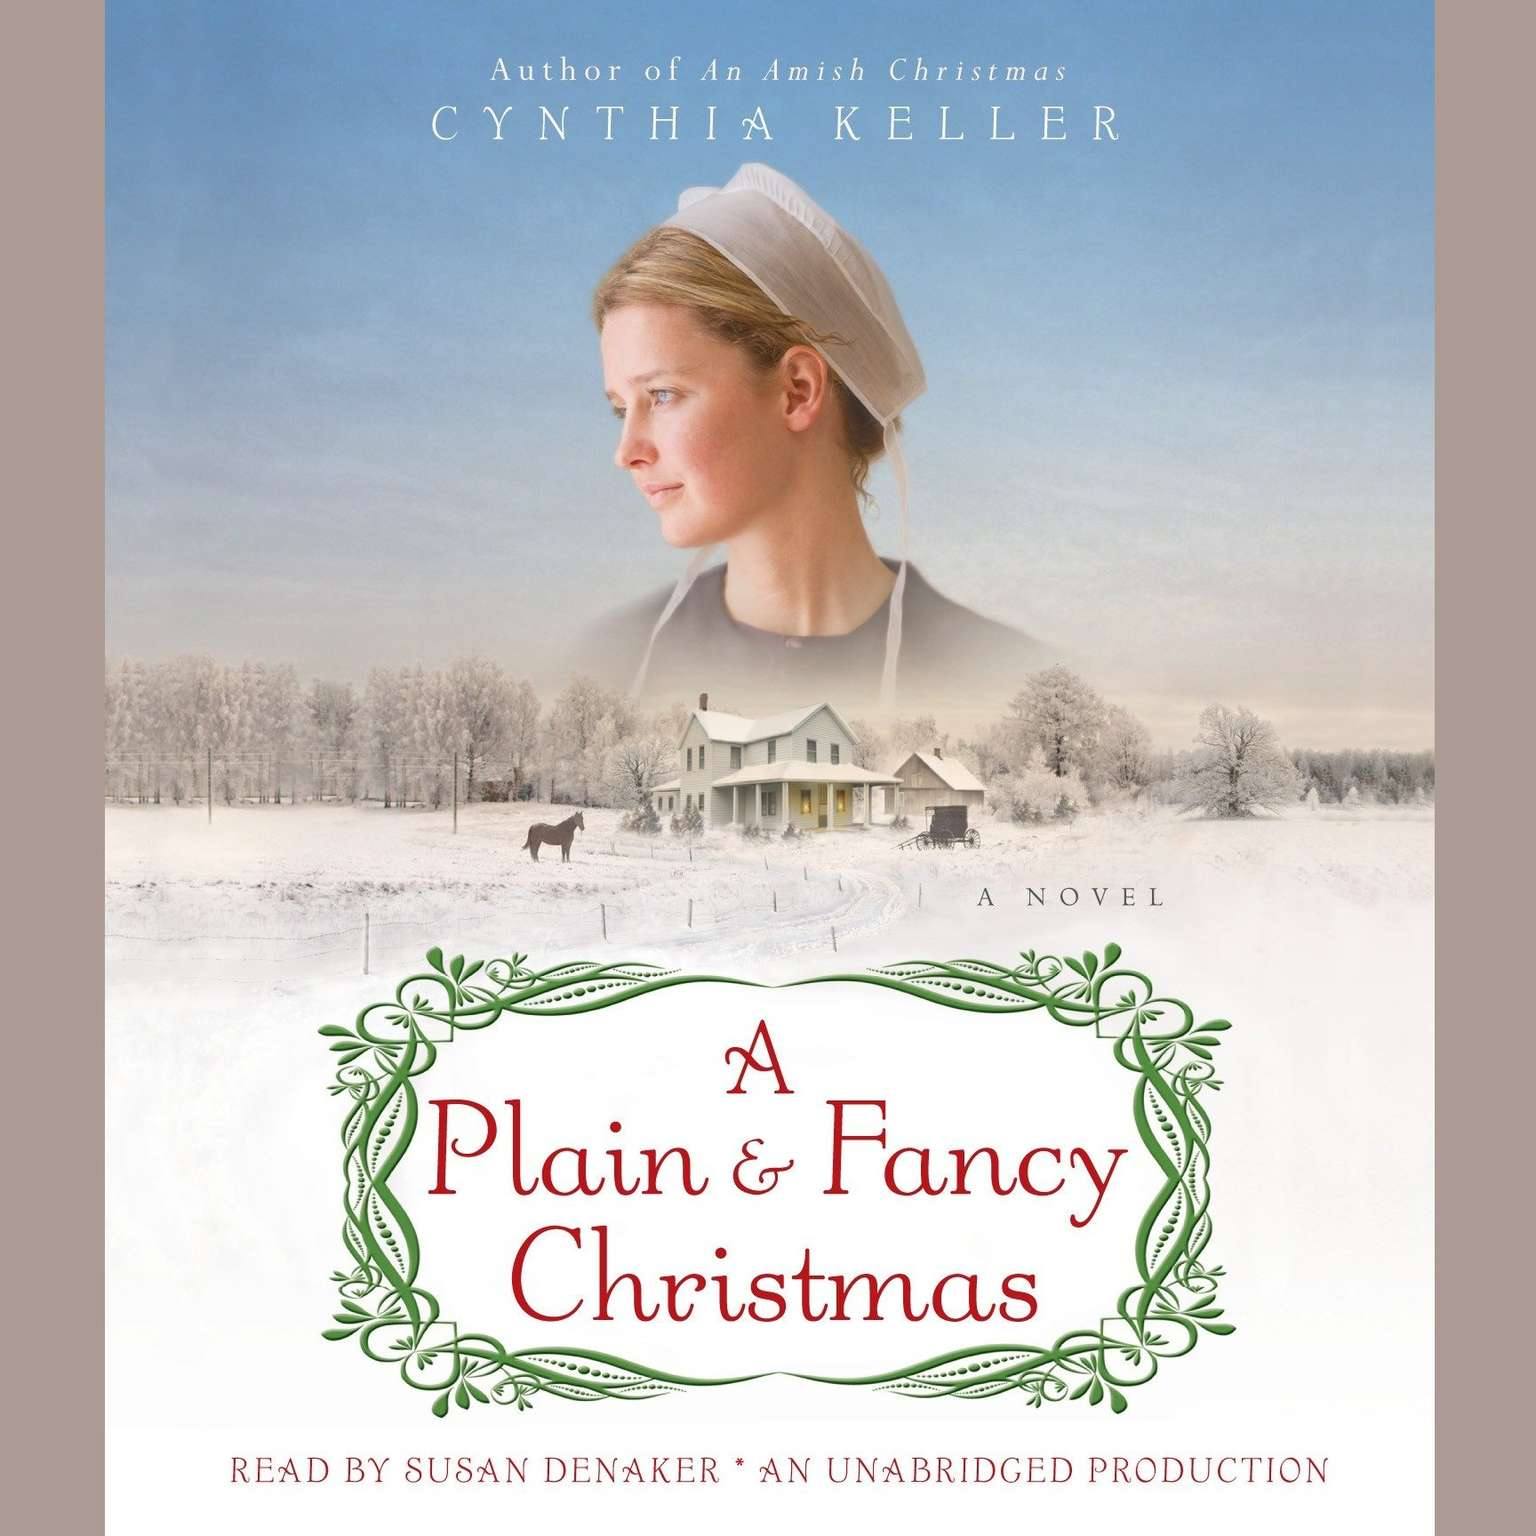 Printable A Plain & Fancy Christmas: A Novel Audiobook Cover Art